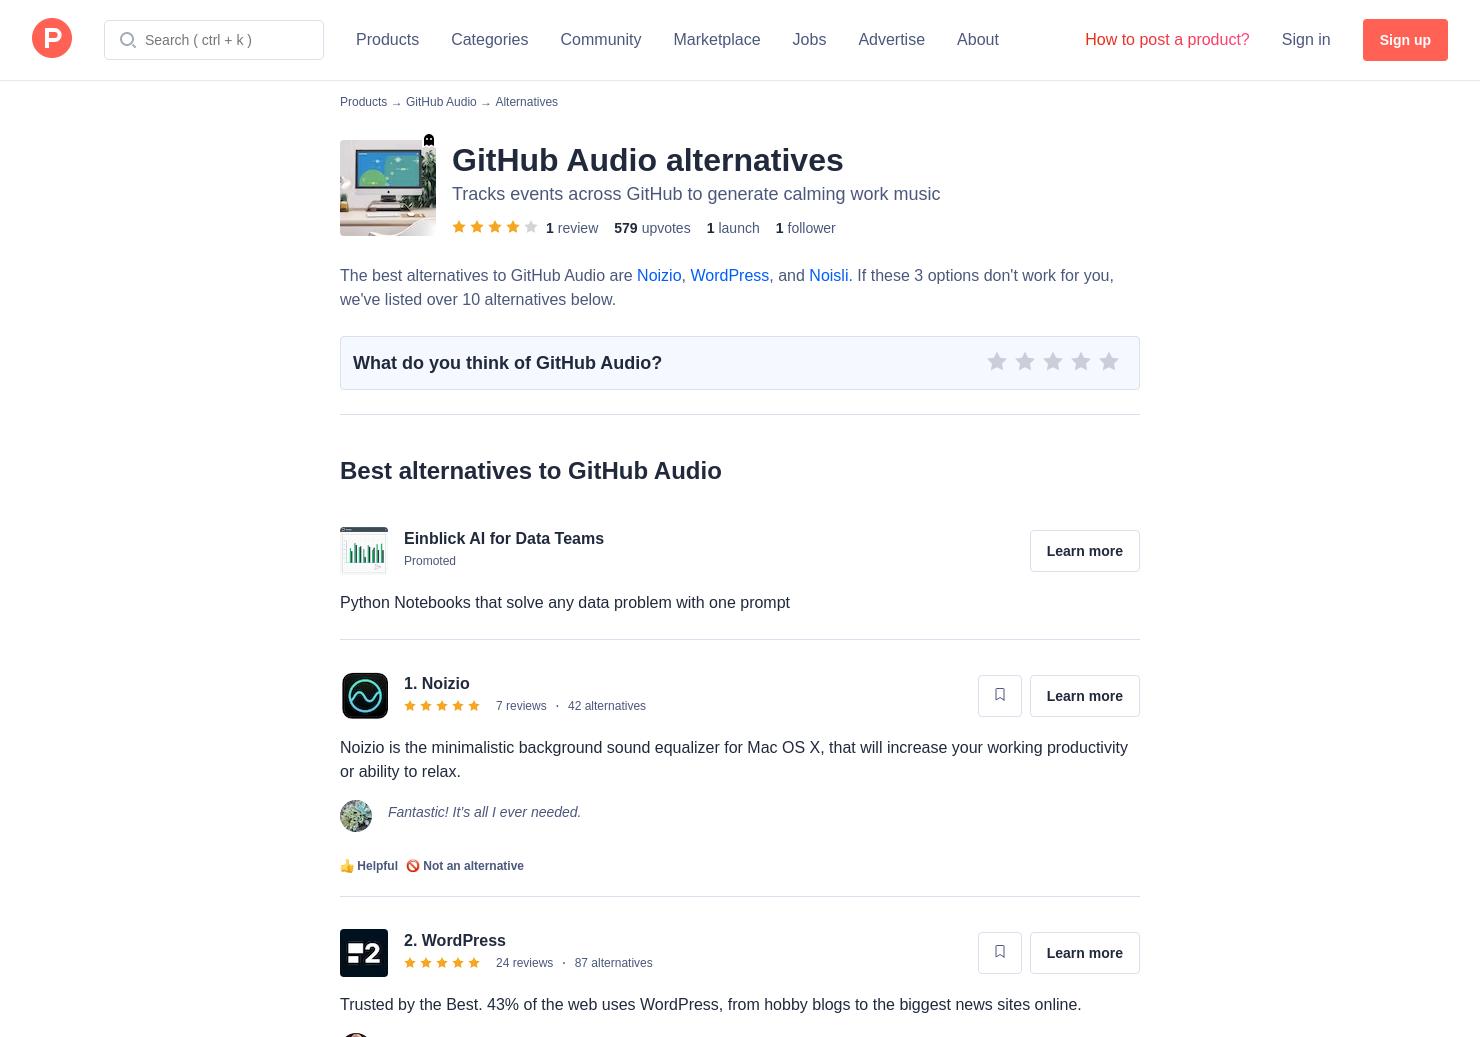 15 Alternatives to GitHub Audio | Product Hunt